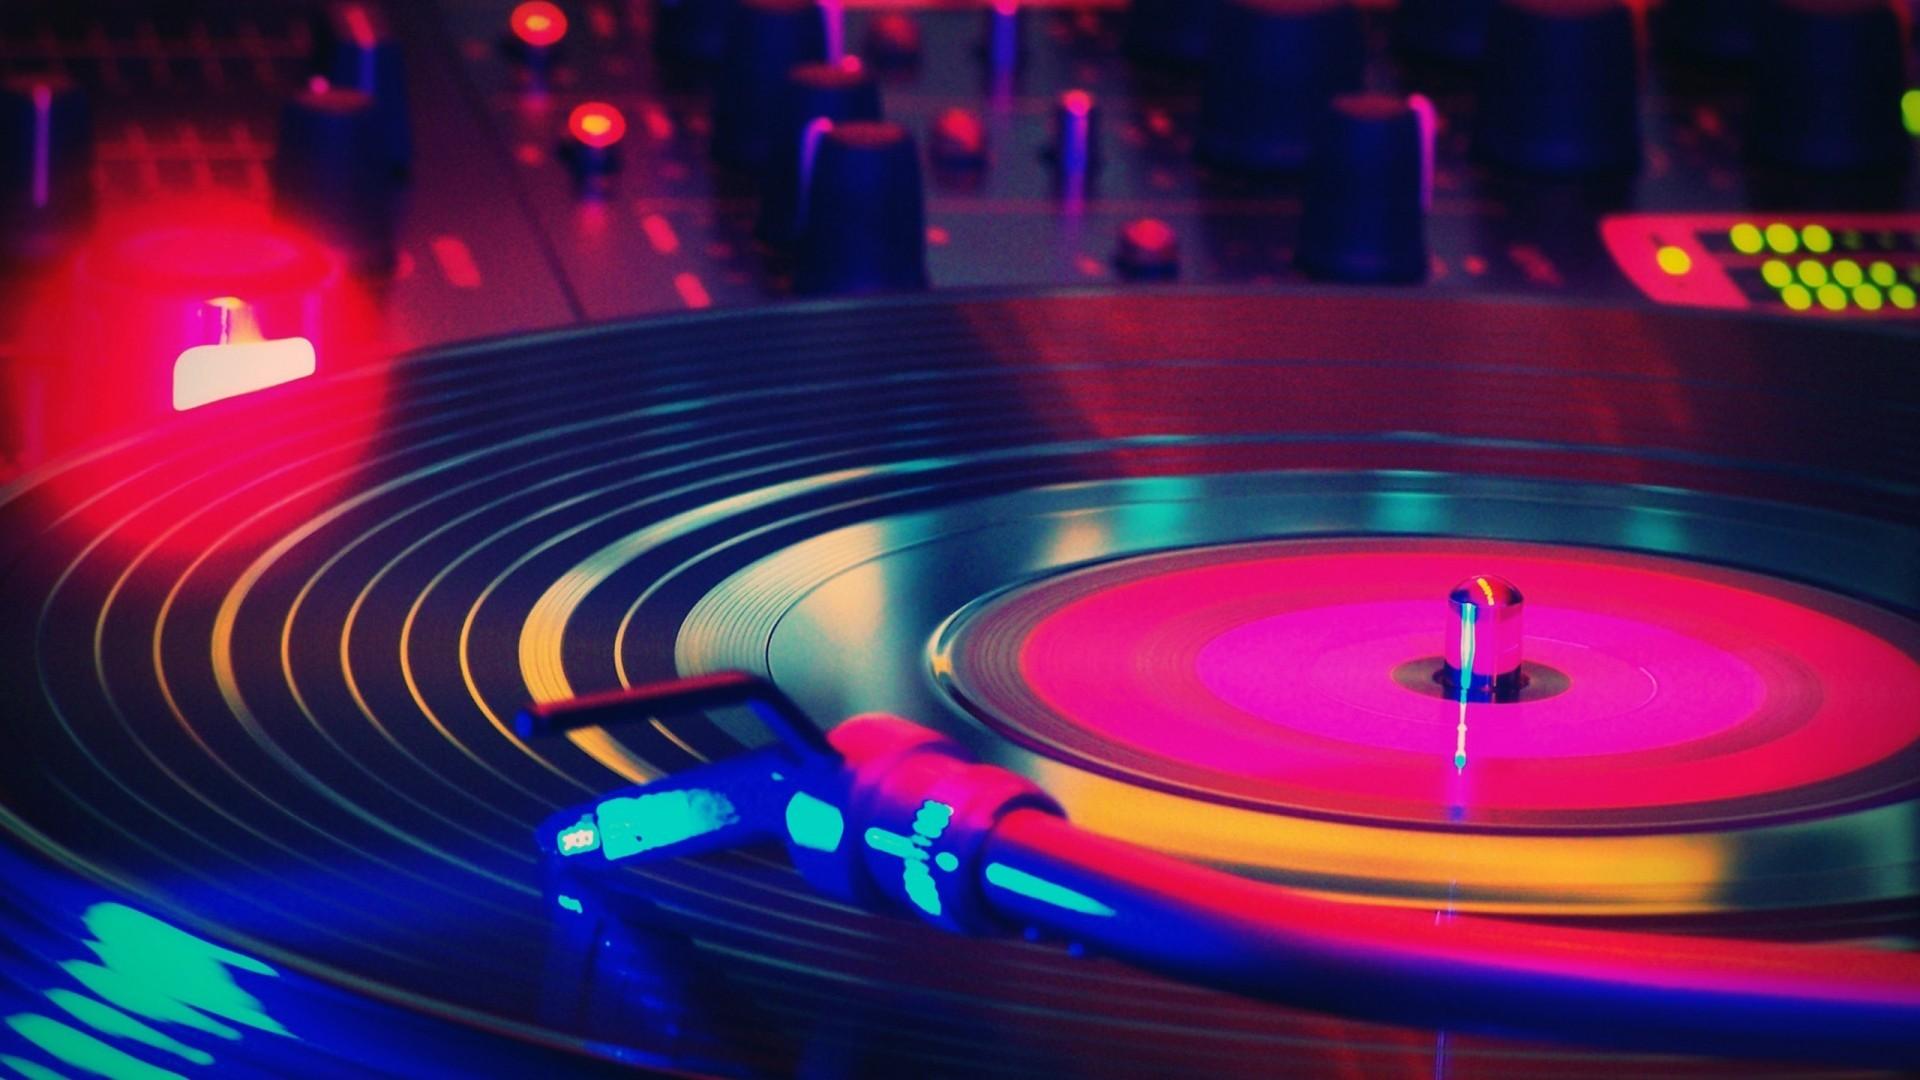 Lights Colorful Music Macro Circle Vinyl Record Players Disco Light Stage Nightclub Venue